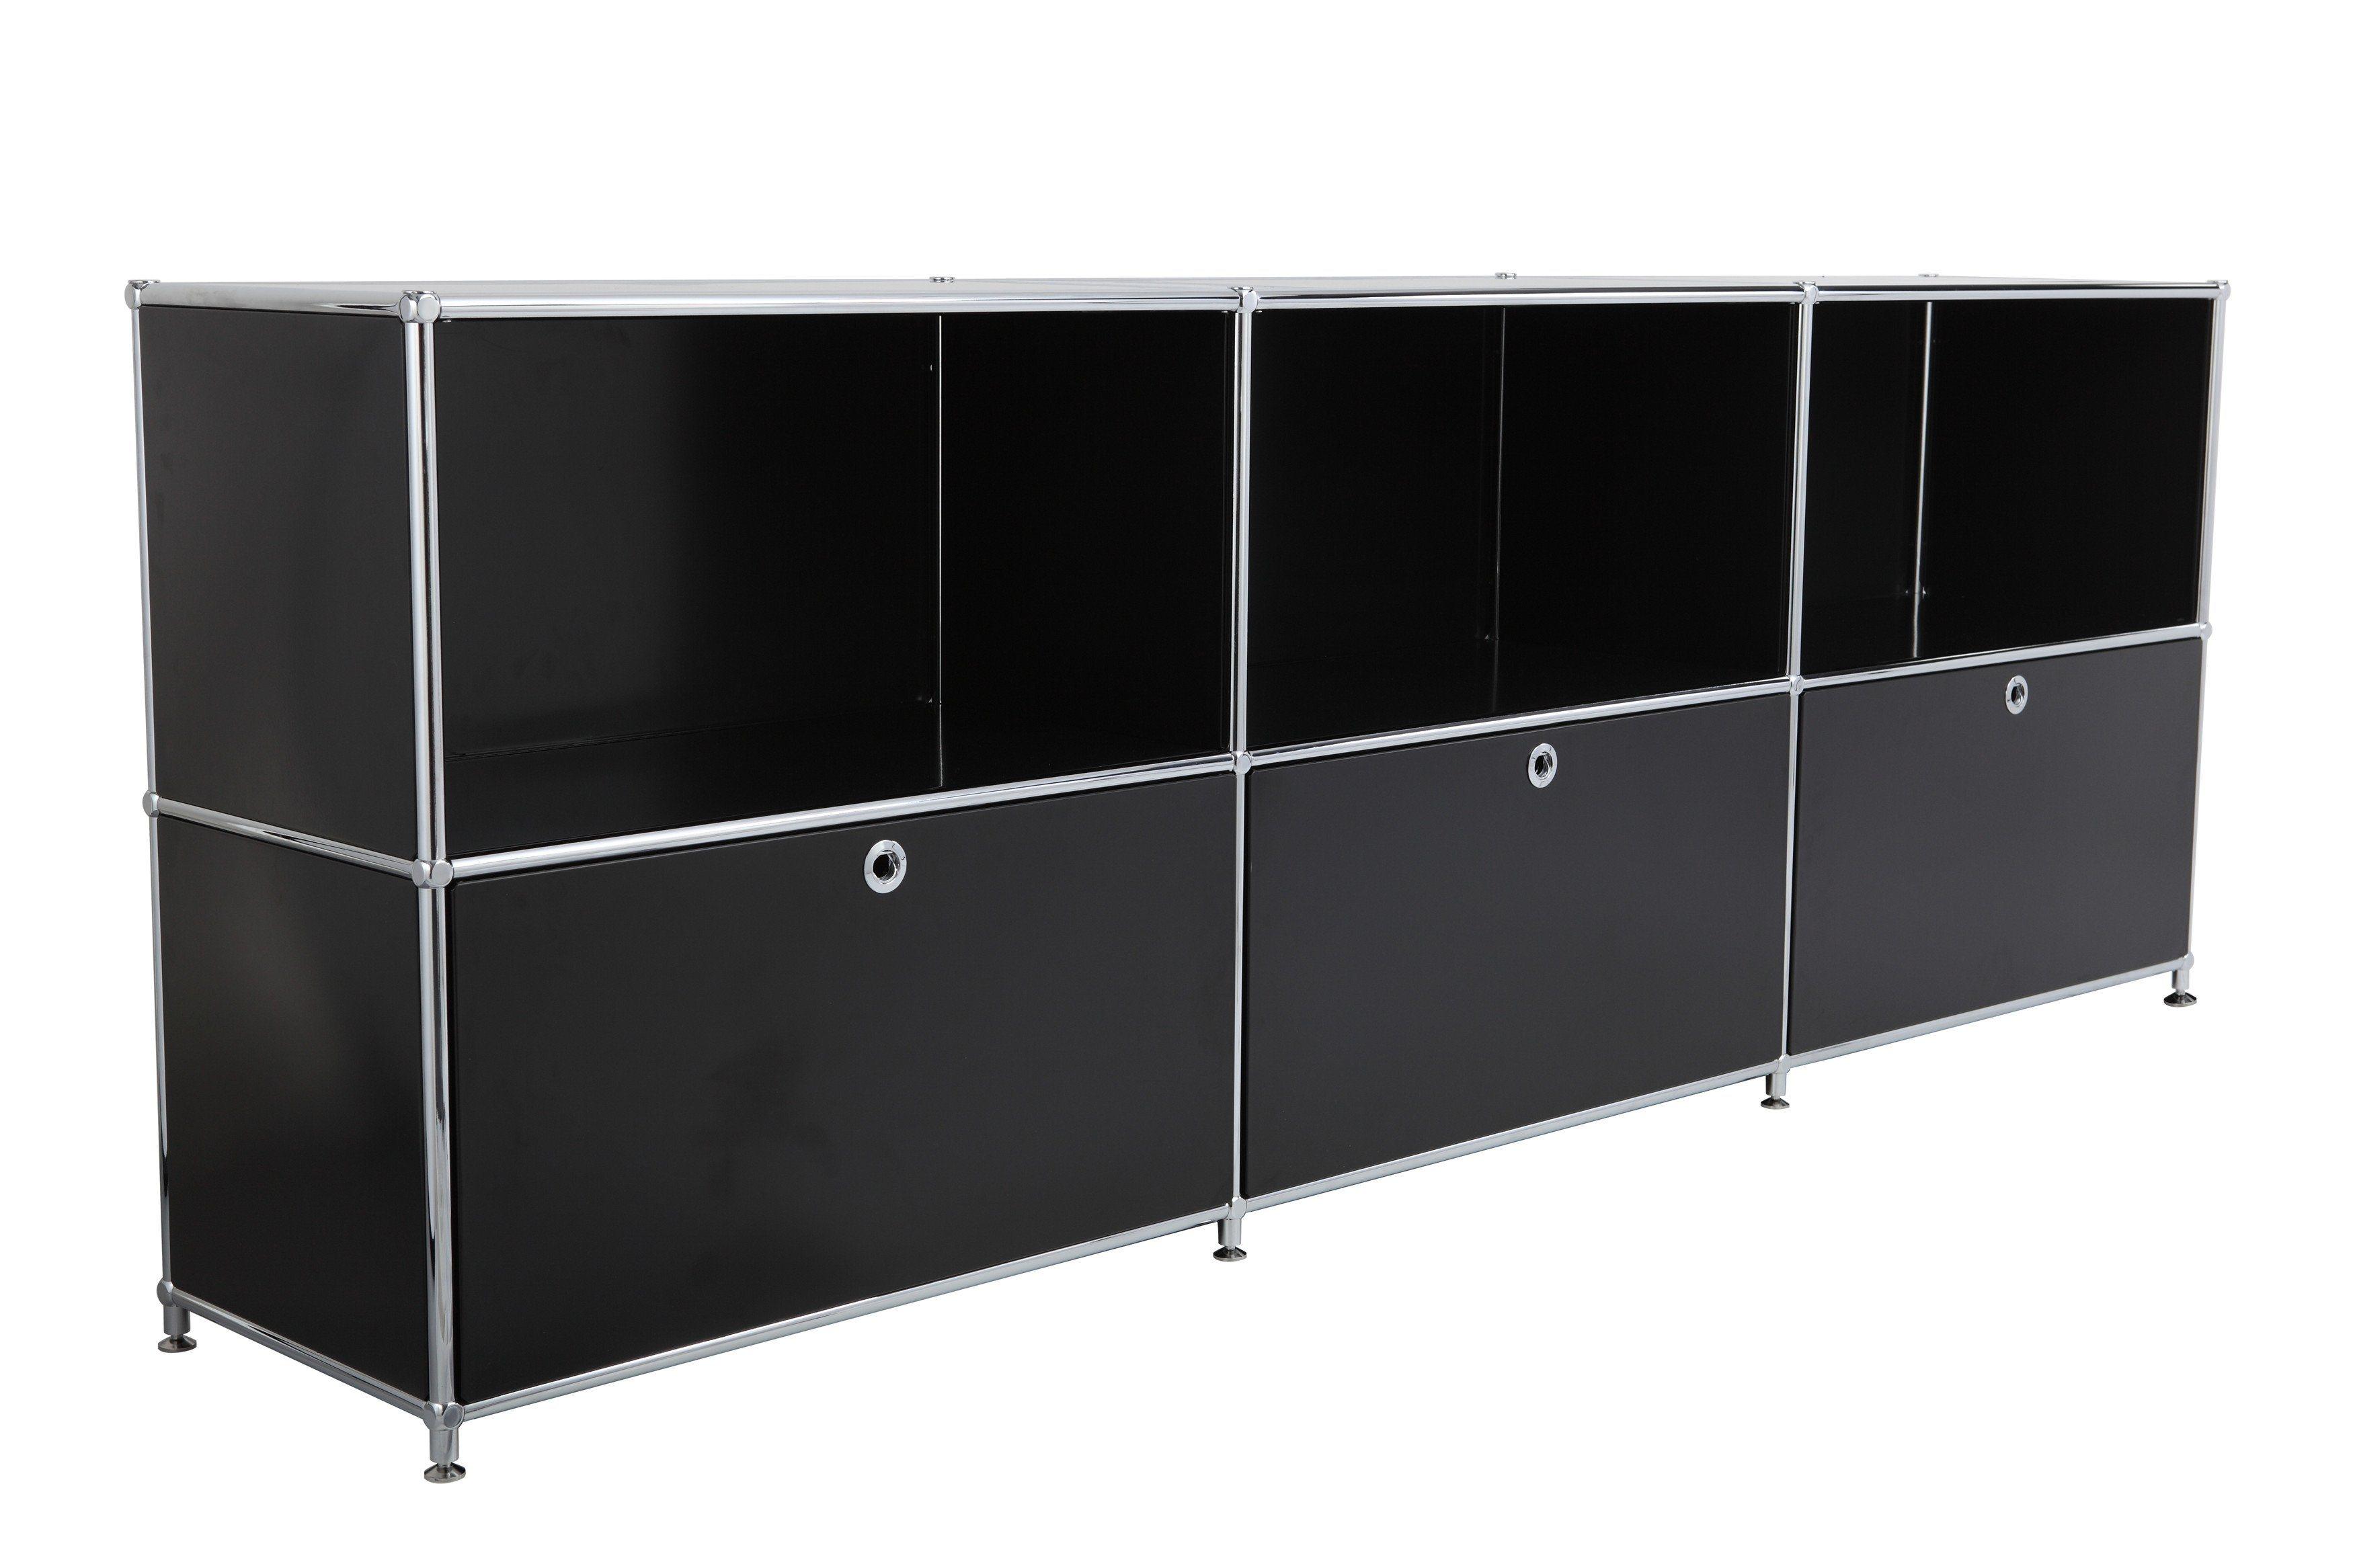 Transcube Modular Office/Home Design Display DIY File Cabinet